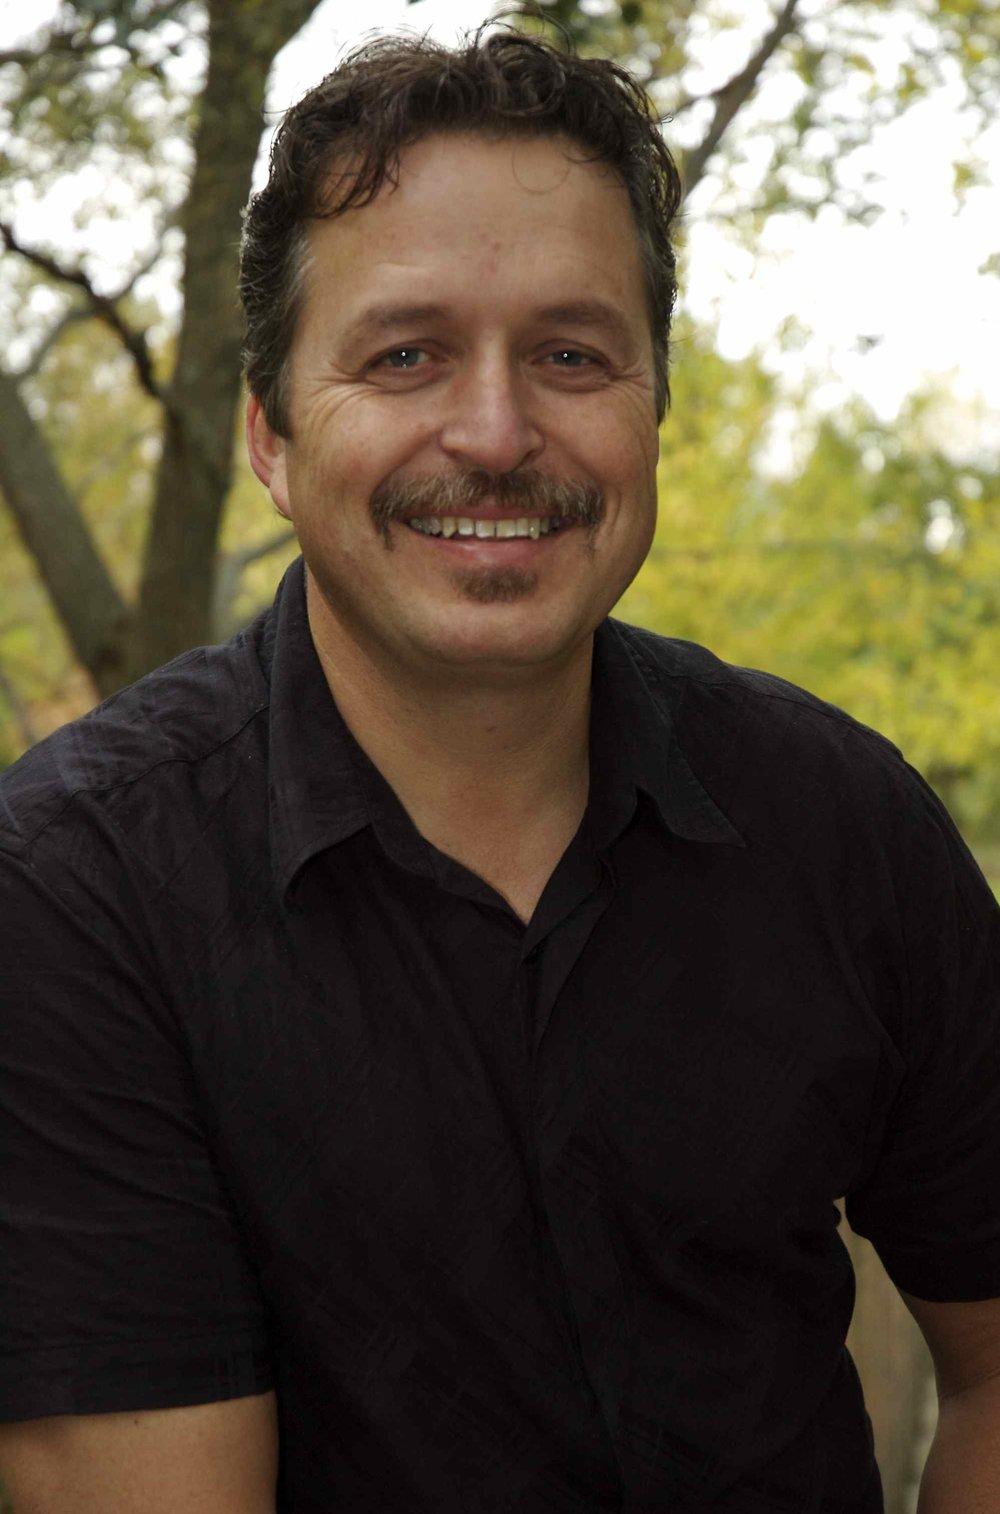 Pete Kuehni